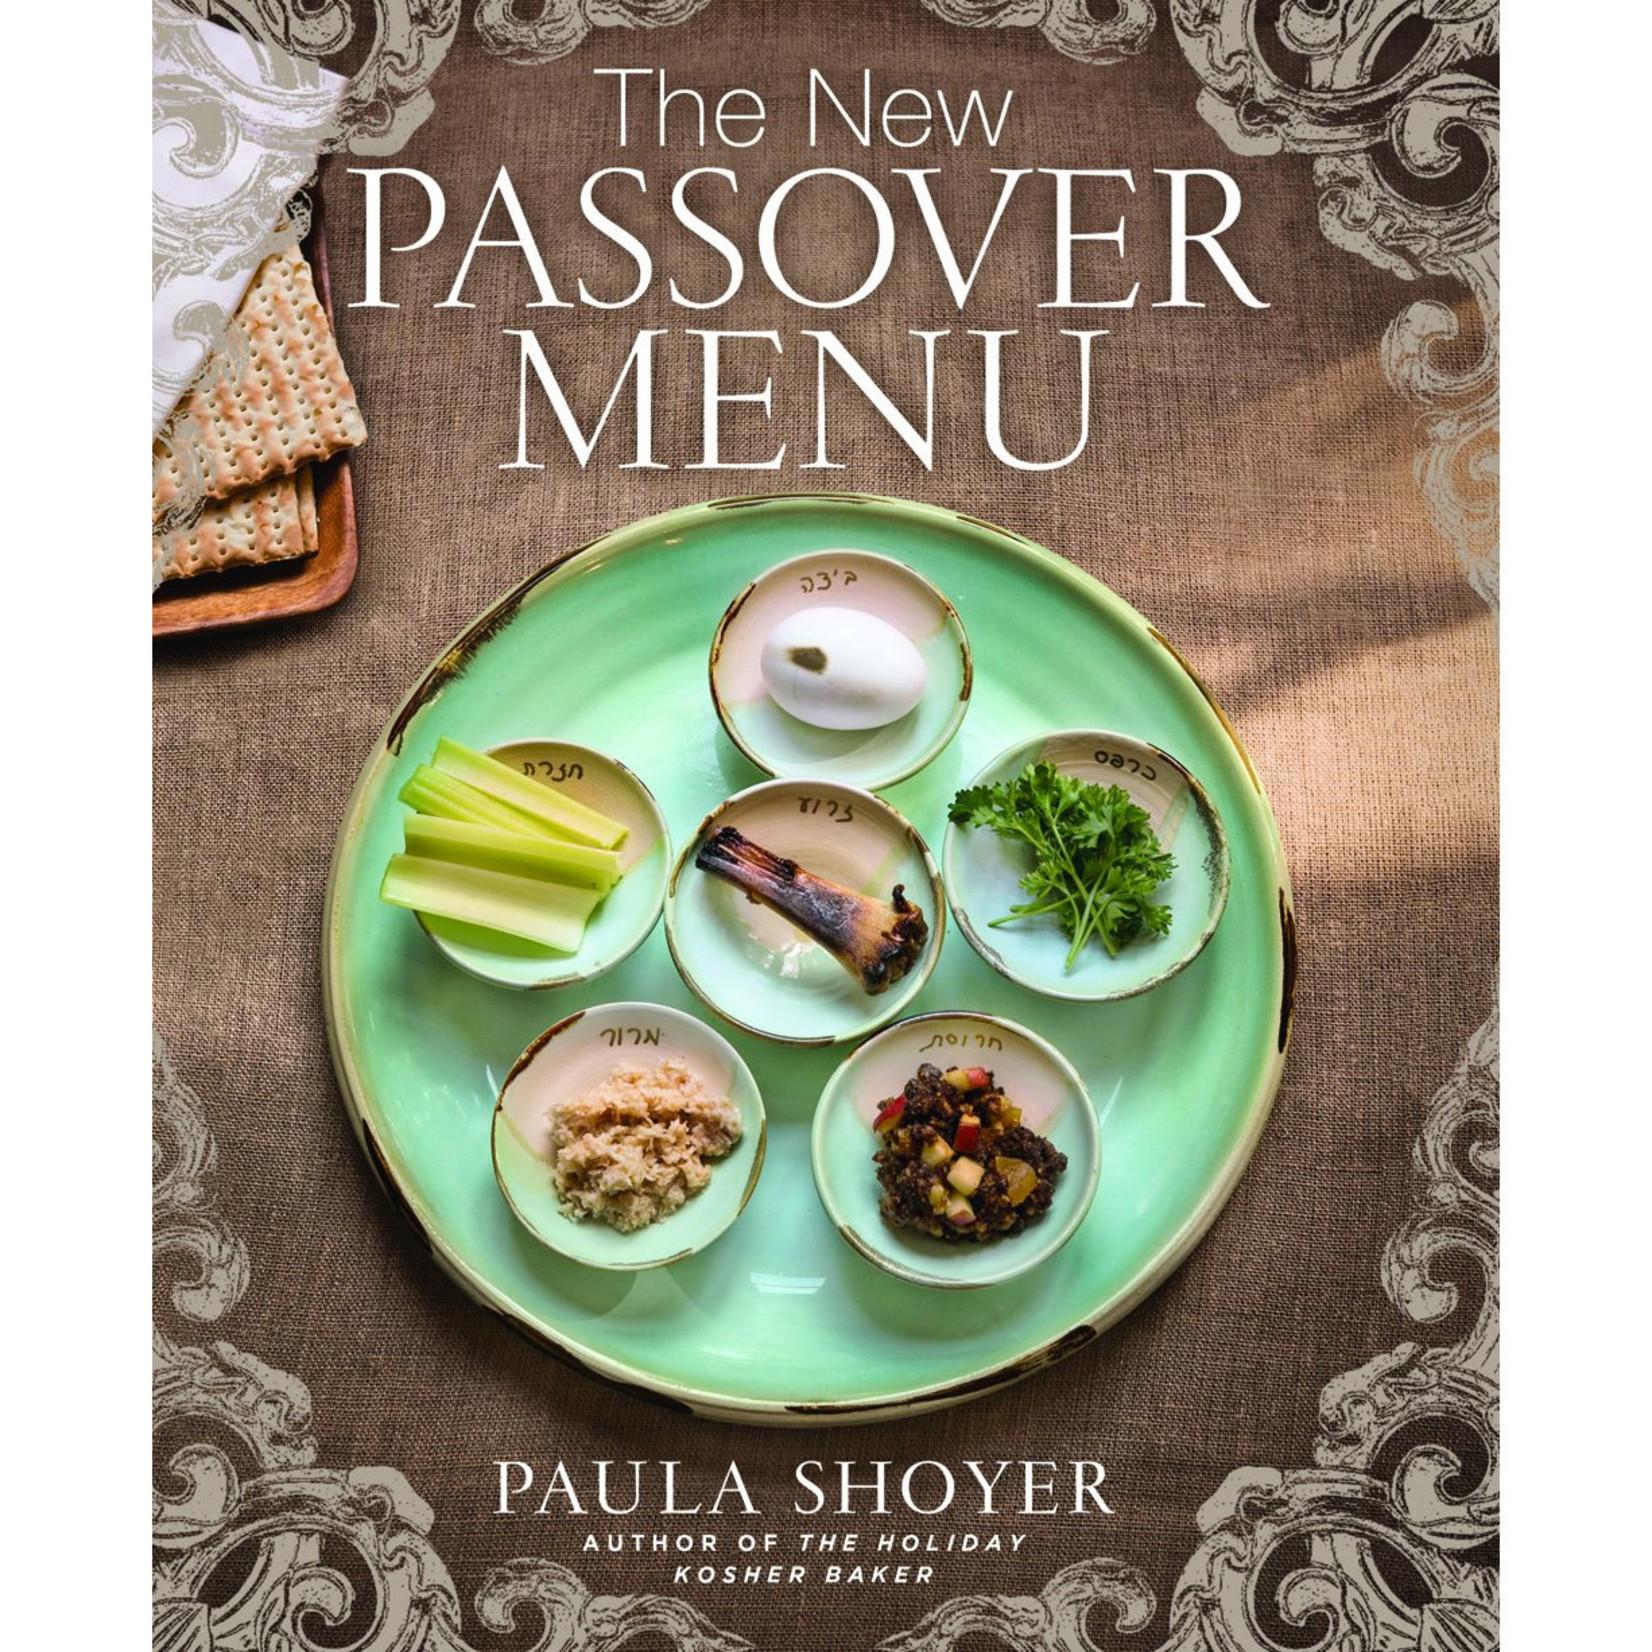 Paula Shoyer New Passover Menu, The